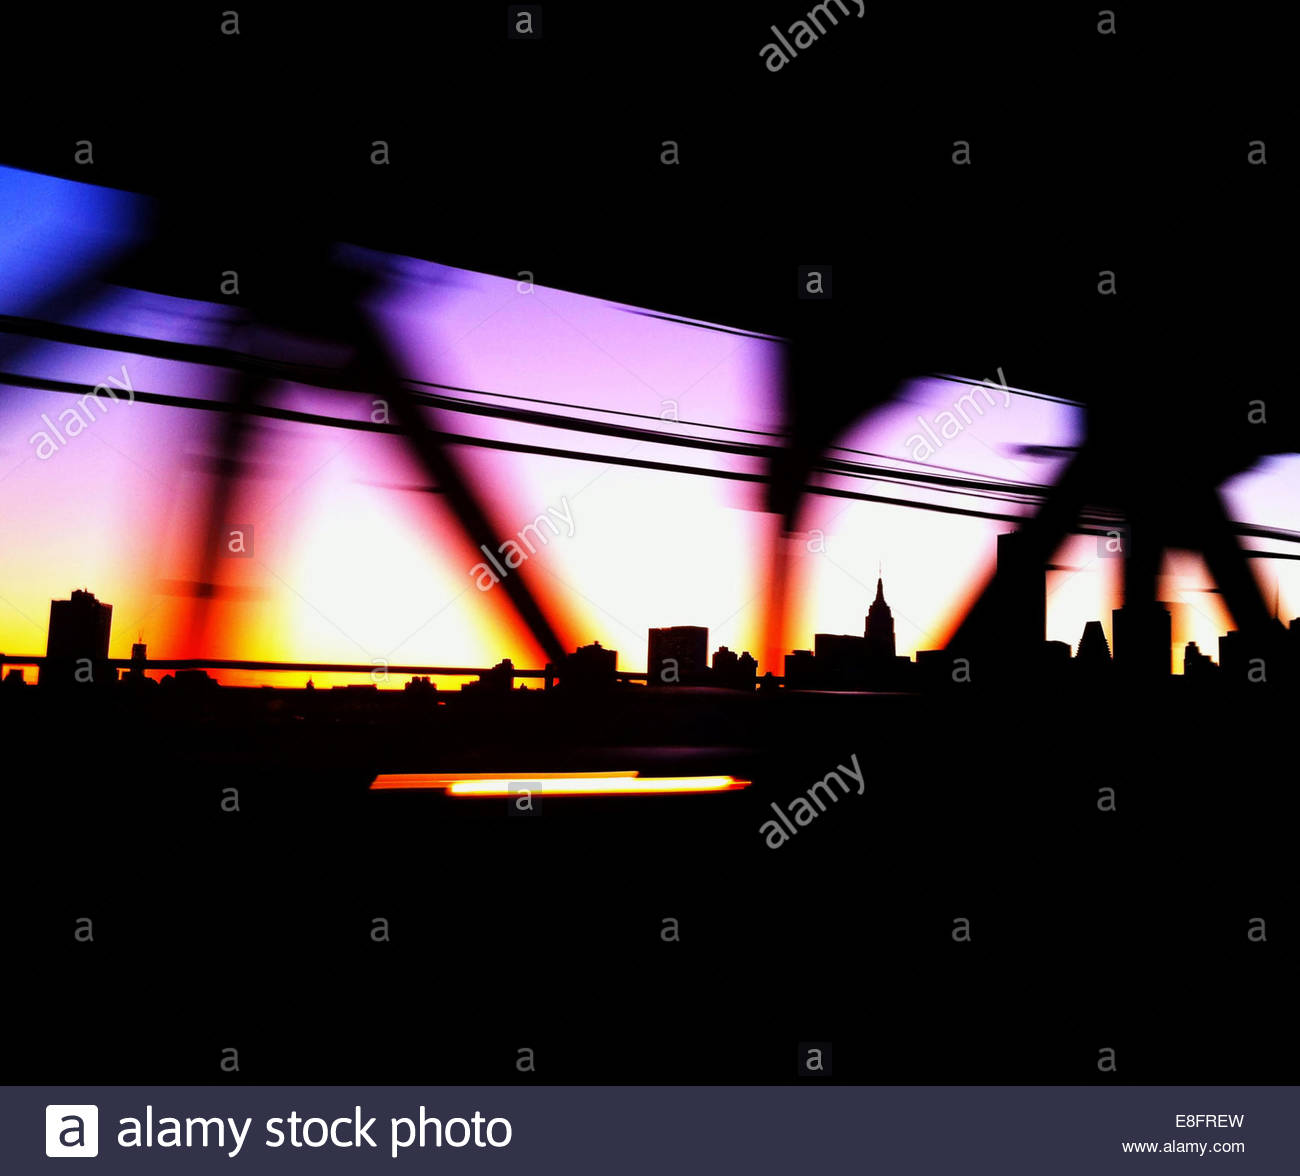 1300x1176 Manhattan Silhouette Stock Photos Amp Manhattan Silhouette Stock